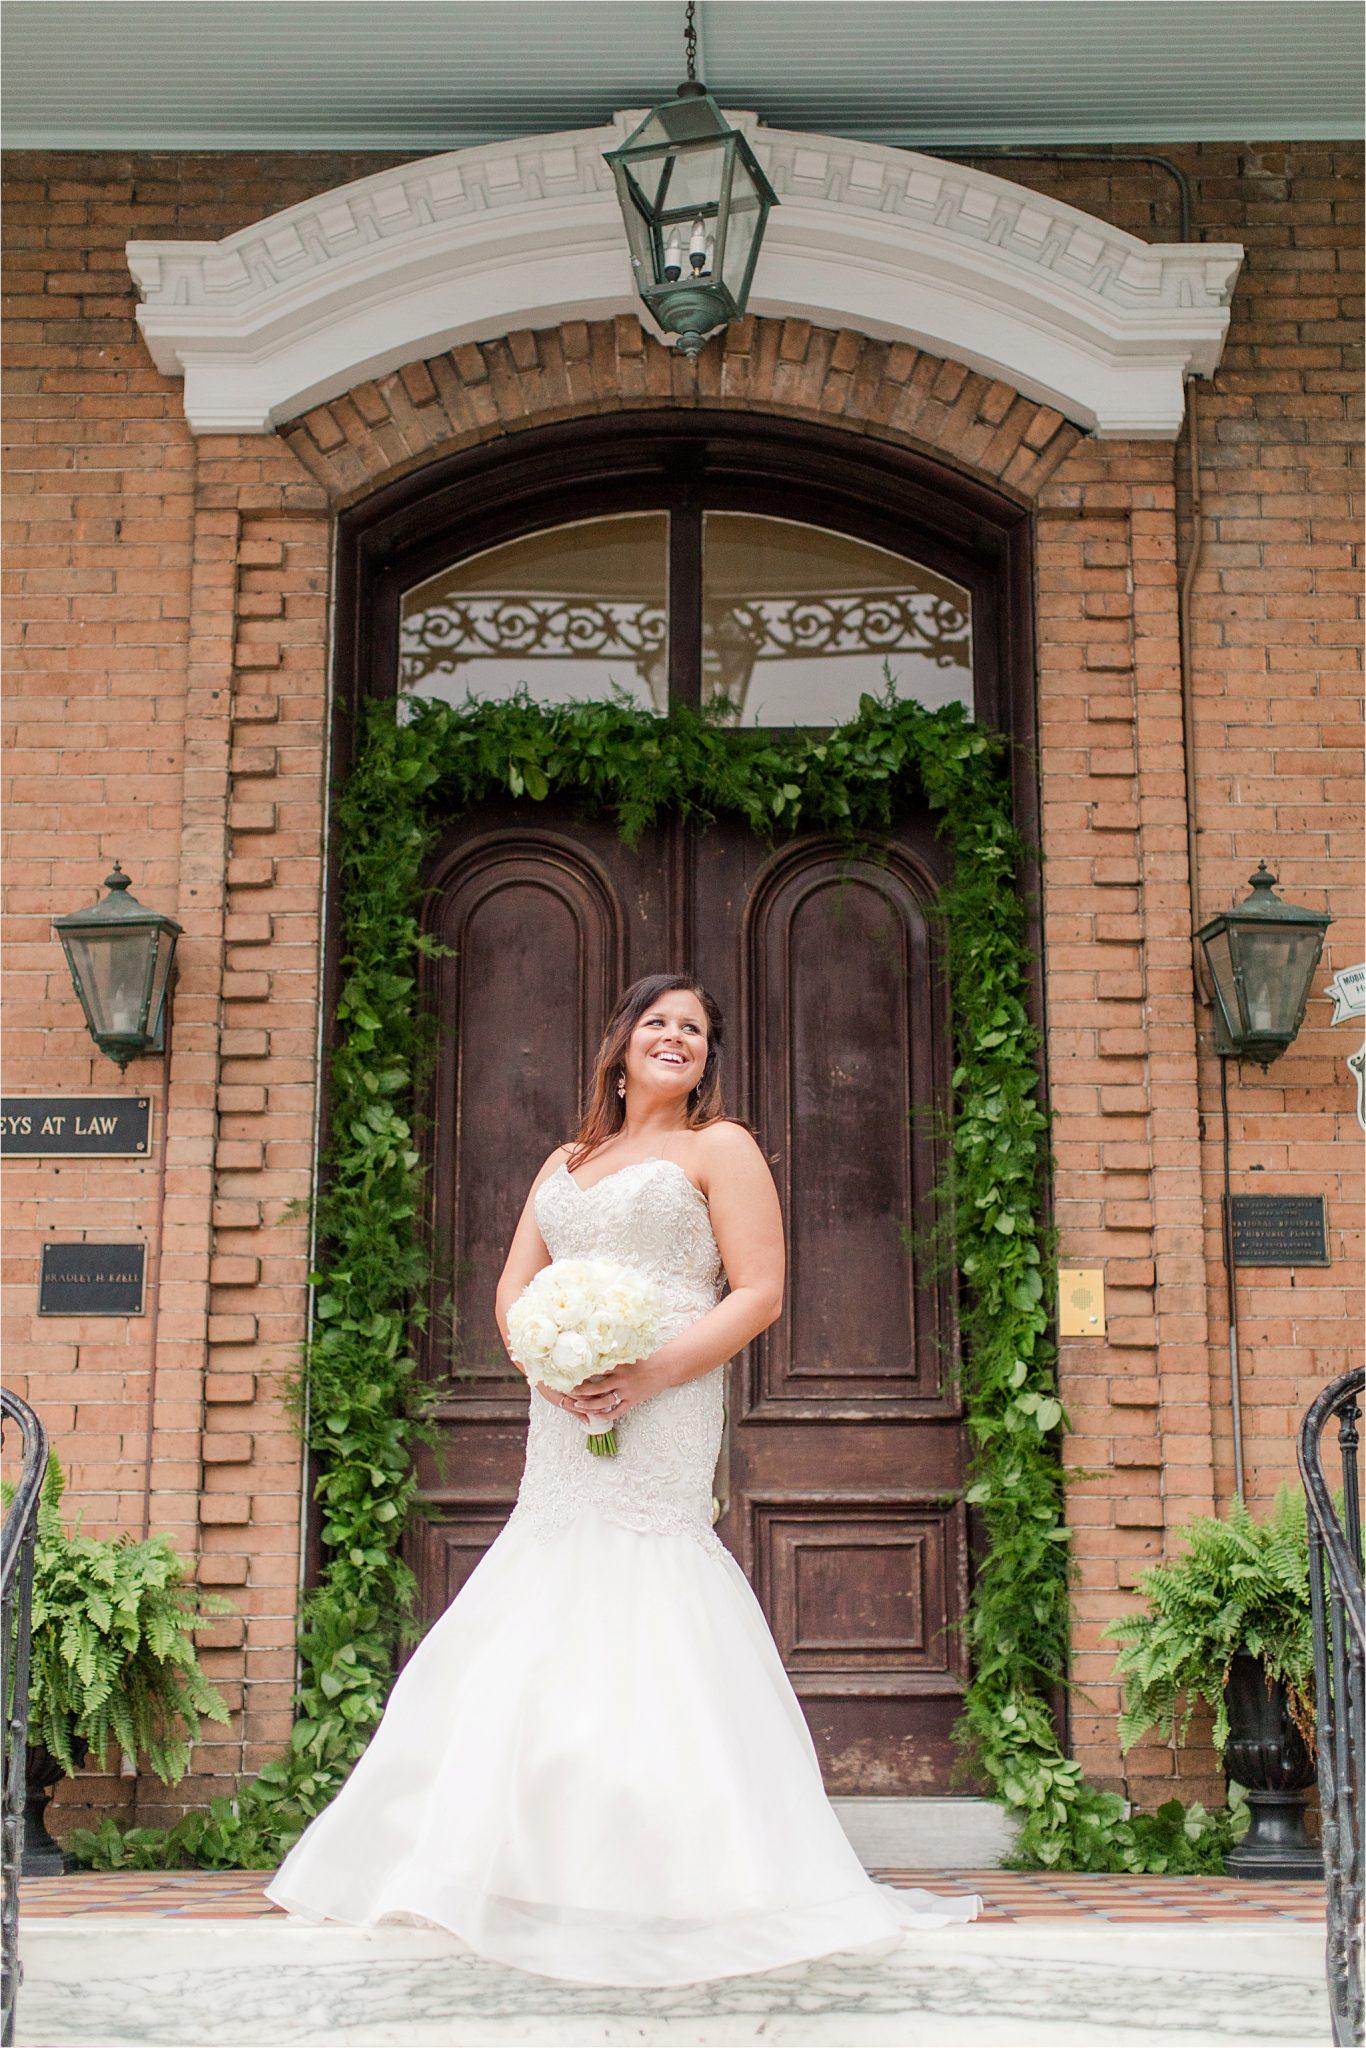 Mermaid wedding dress-bridal photos-brick background-ivy-frame